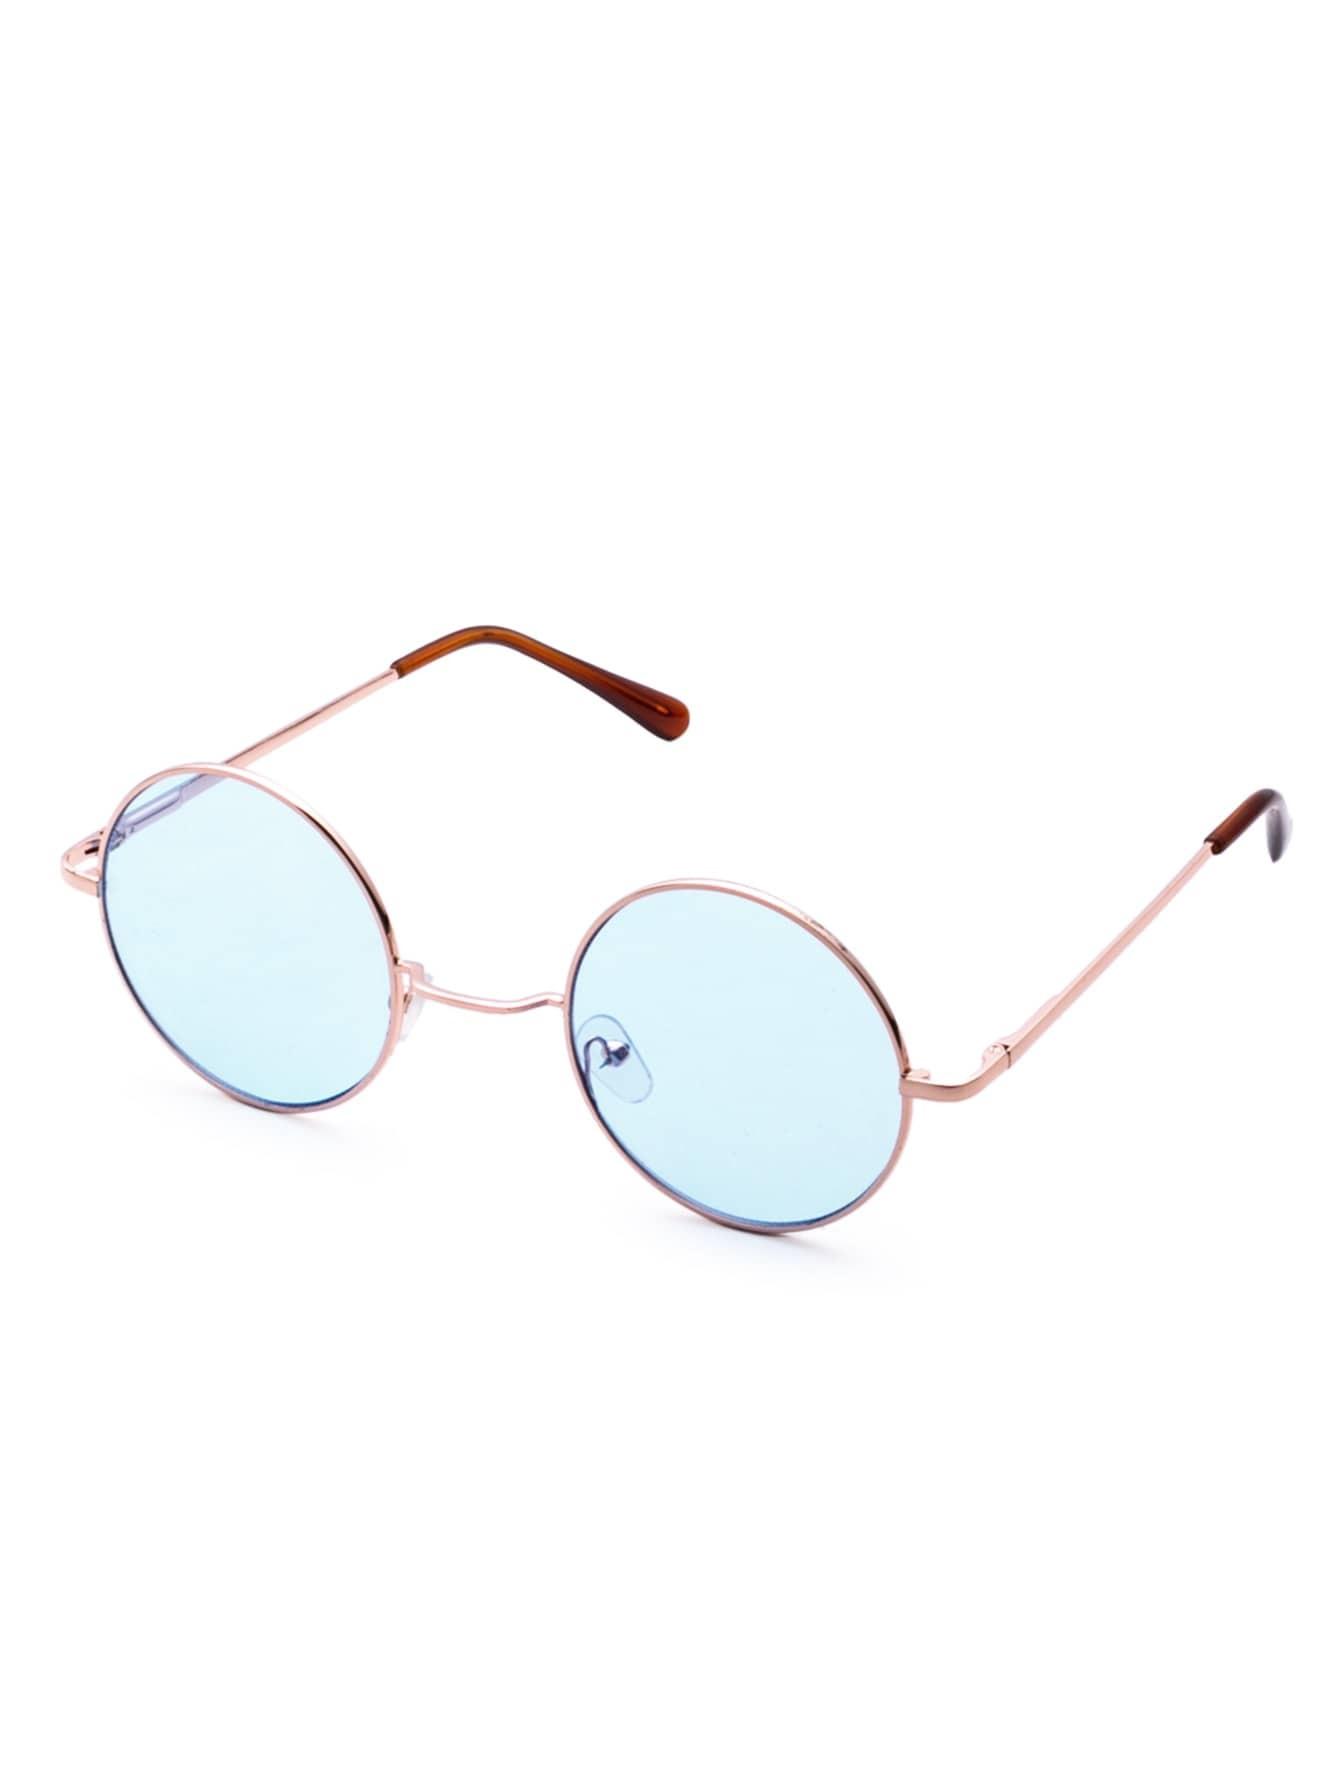 Gold Frame Light Blue Retro Style Round Sunglasses